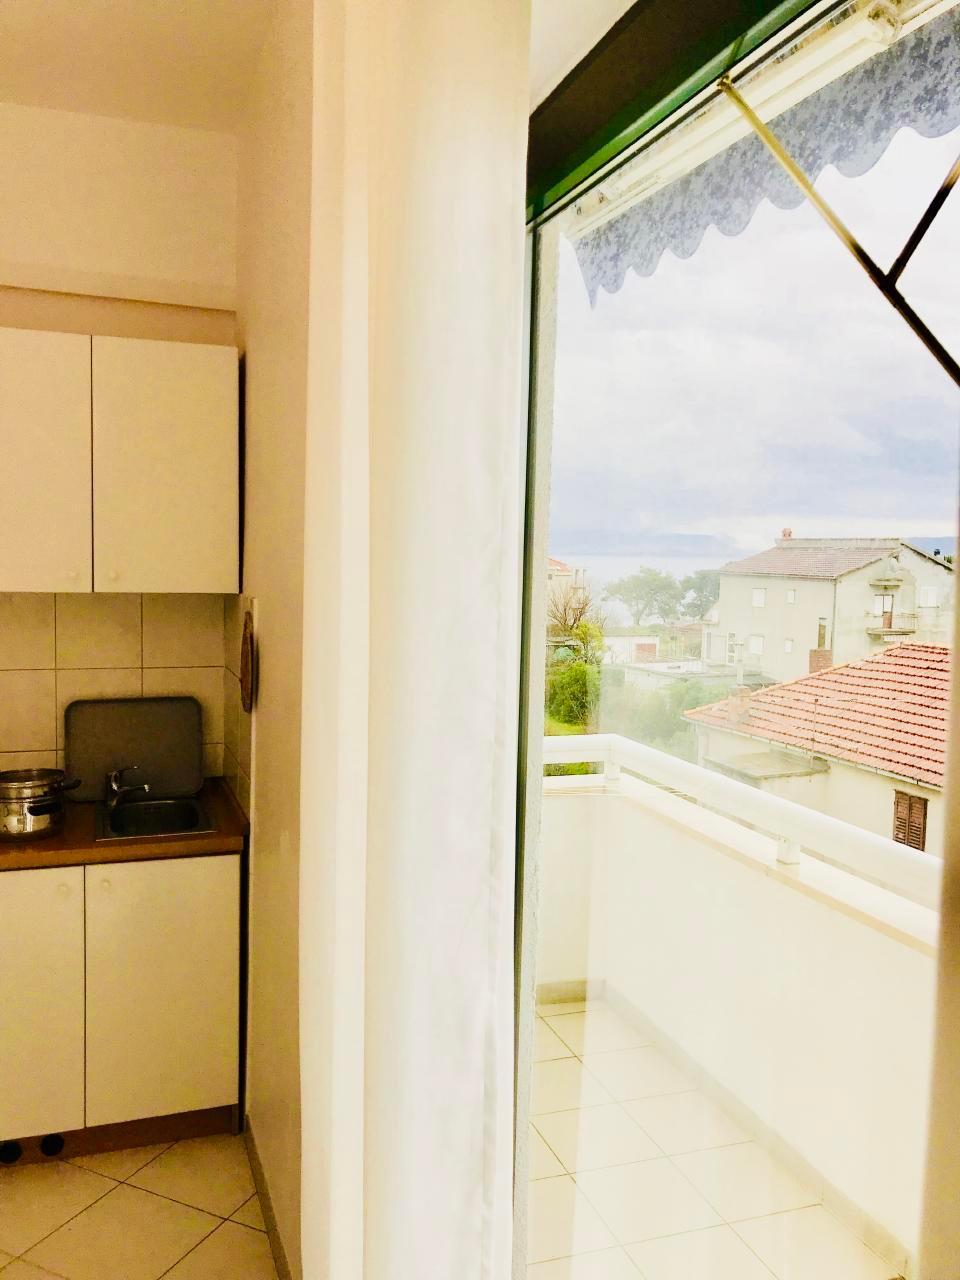 Ferienwohnung Apartmenthaus Ruza 7 - Studio (98388), Kaštel Štafilić, , Dalmatien, Kroatien, Bild 17